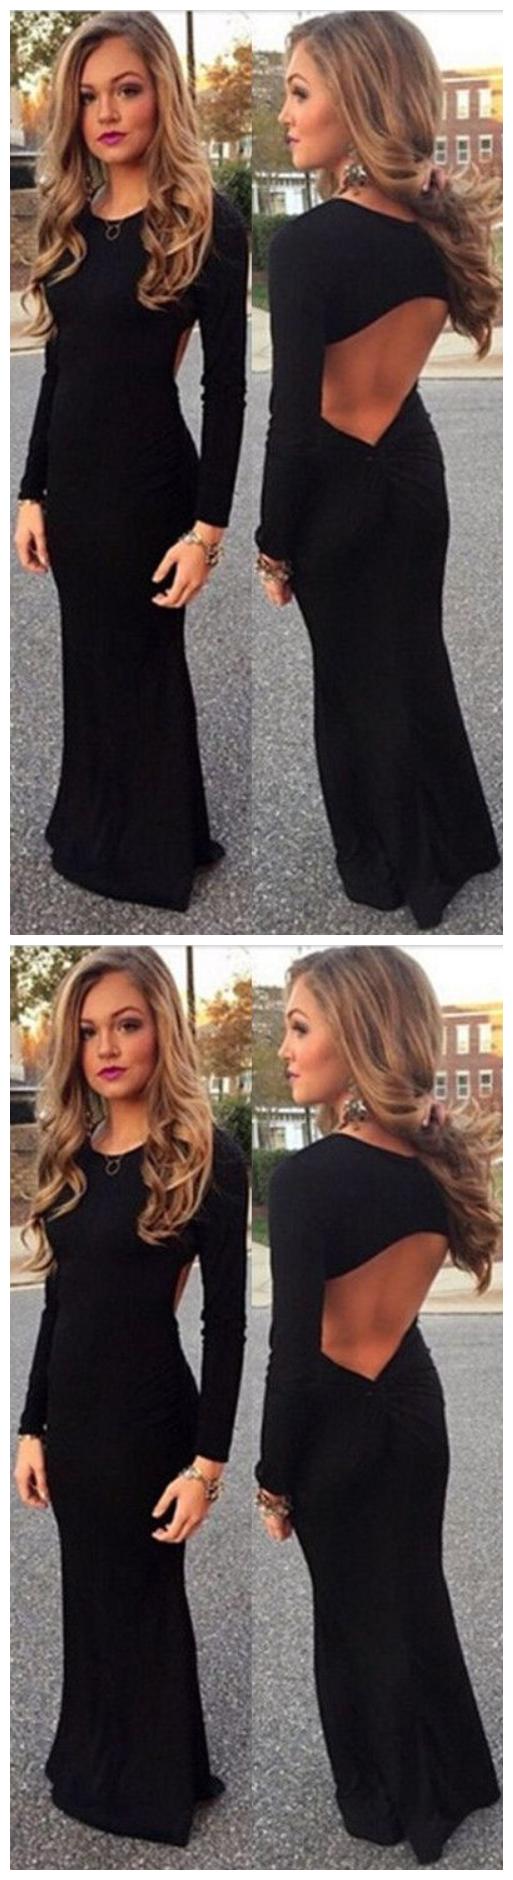 Spandex Prom Dress Sexy Backless Long Prom Dresses Elegant Full Sleeve Scoop